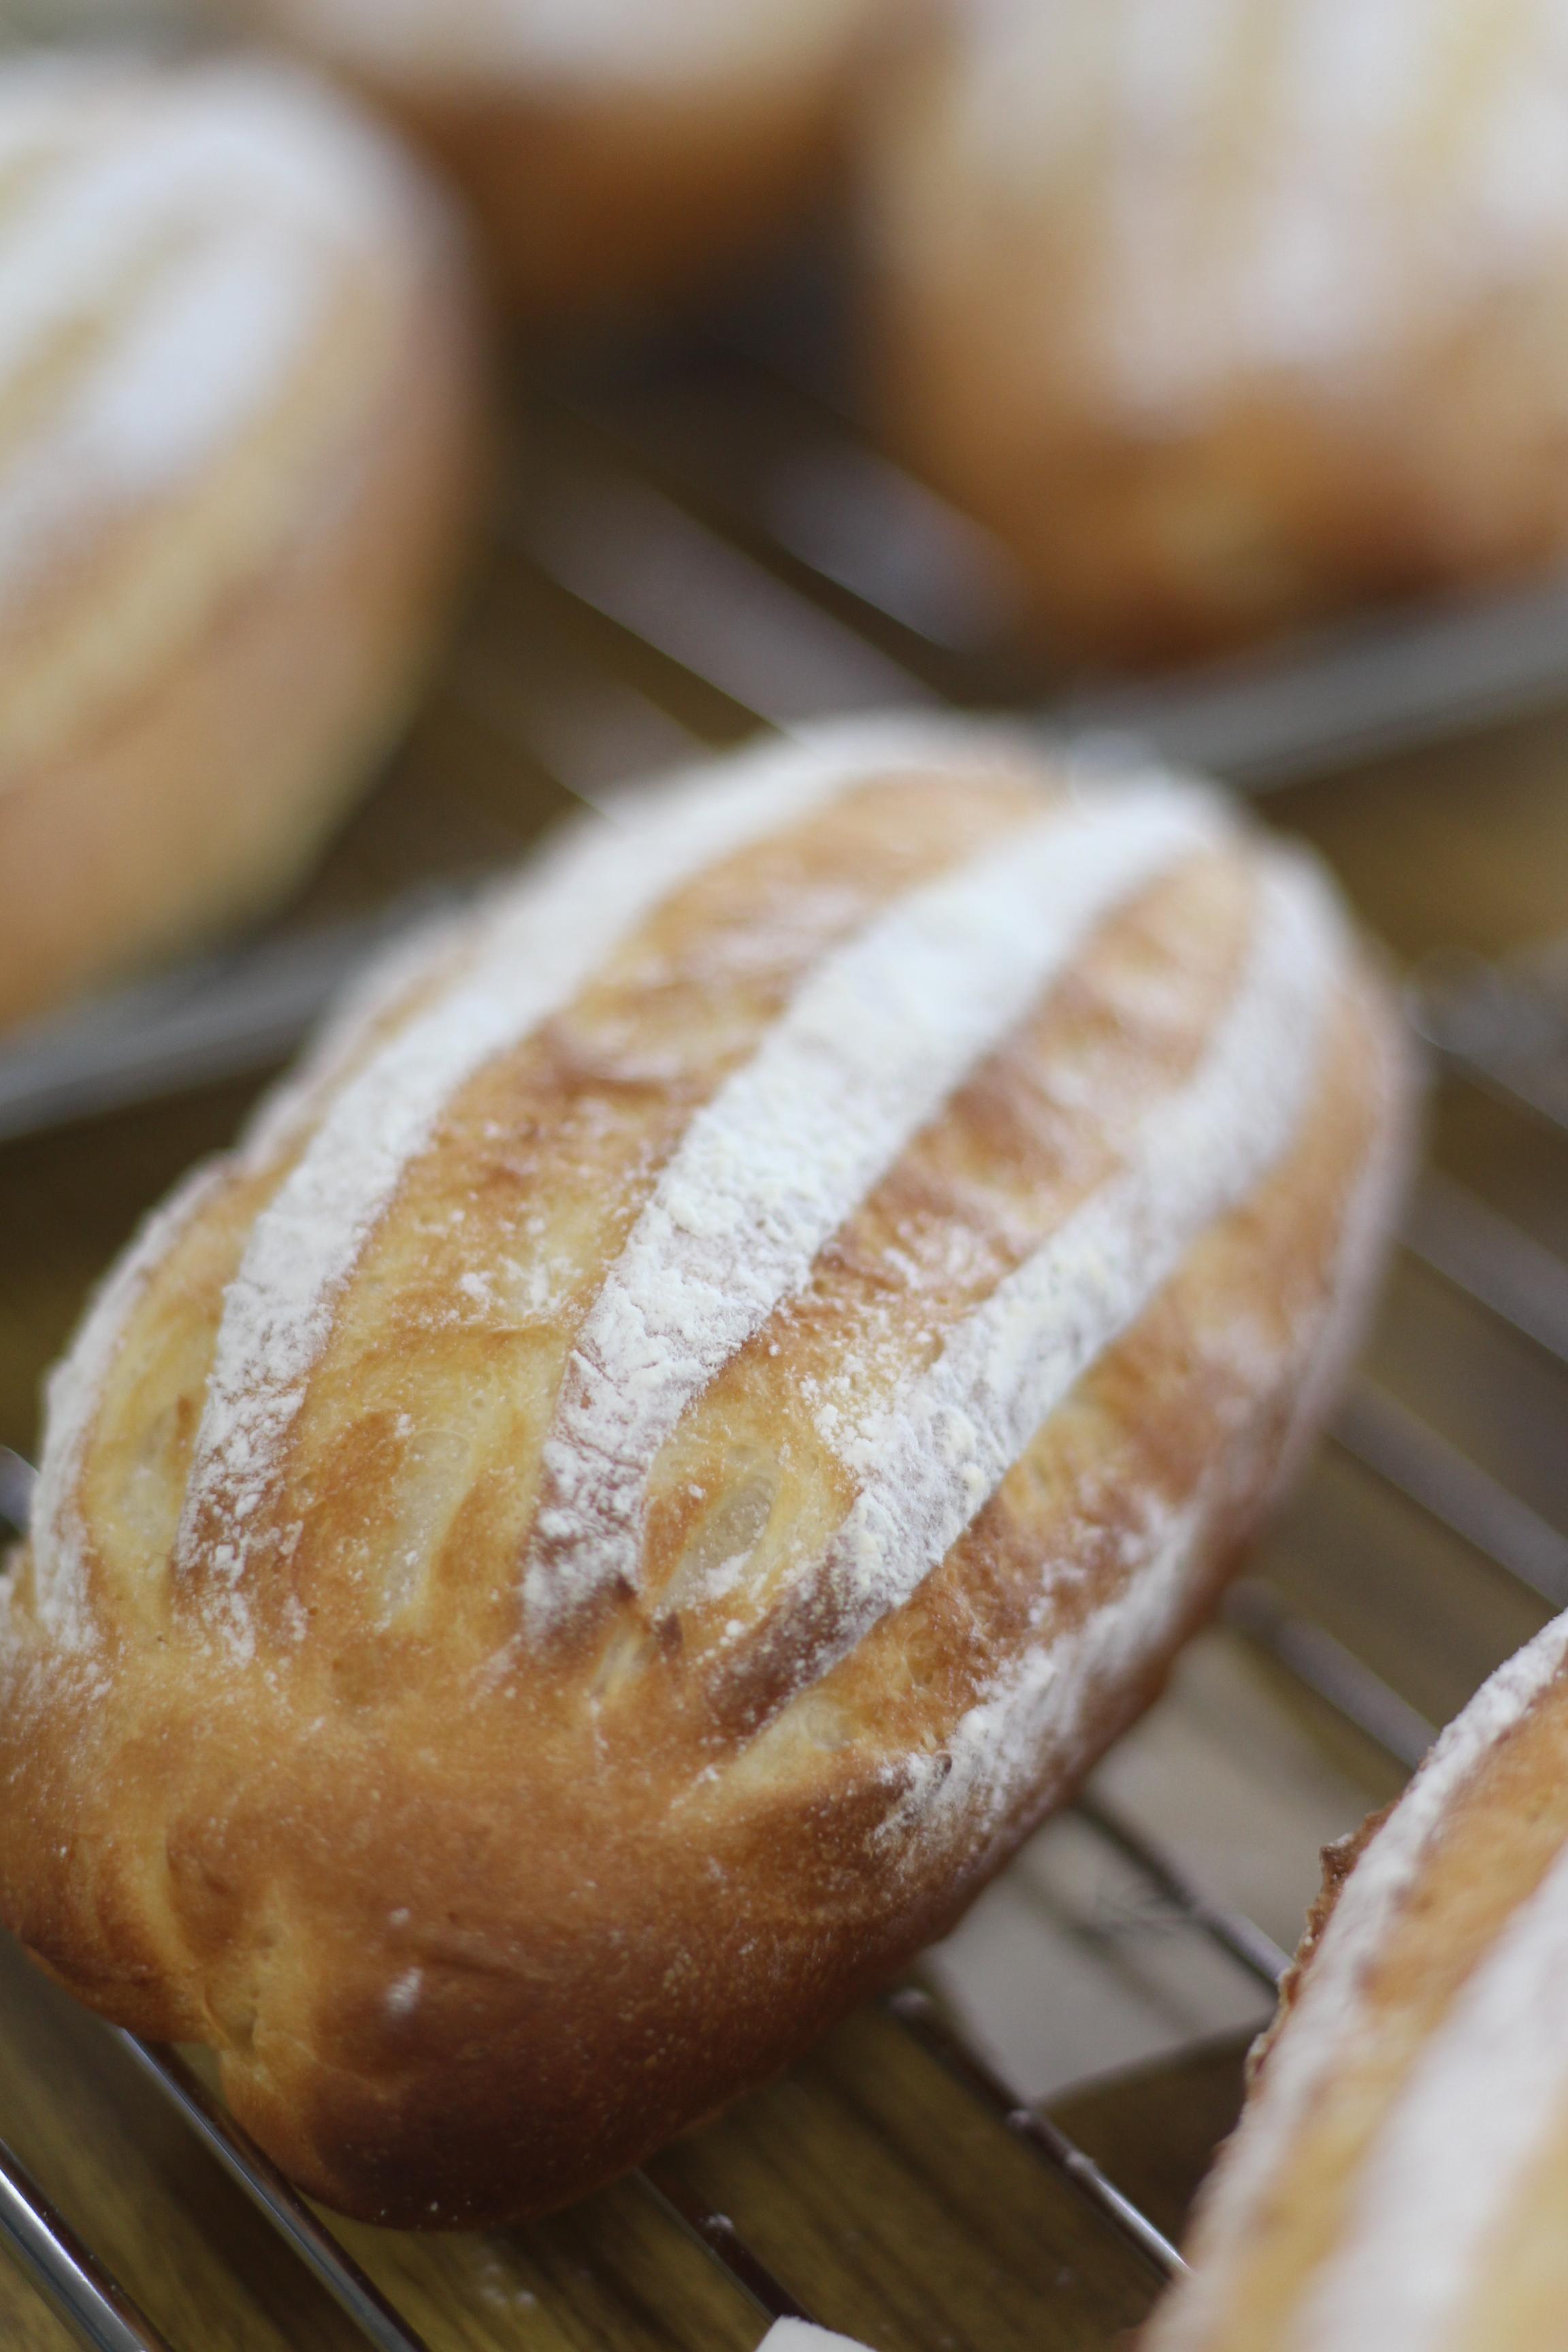 a-ta-sante糖質制限パン料理教室、阿倍野区西田辺、会館でのレッスン『セミハードブレッド』